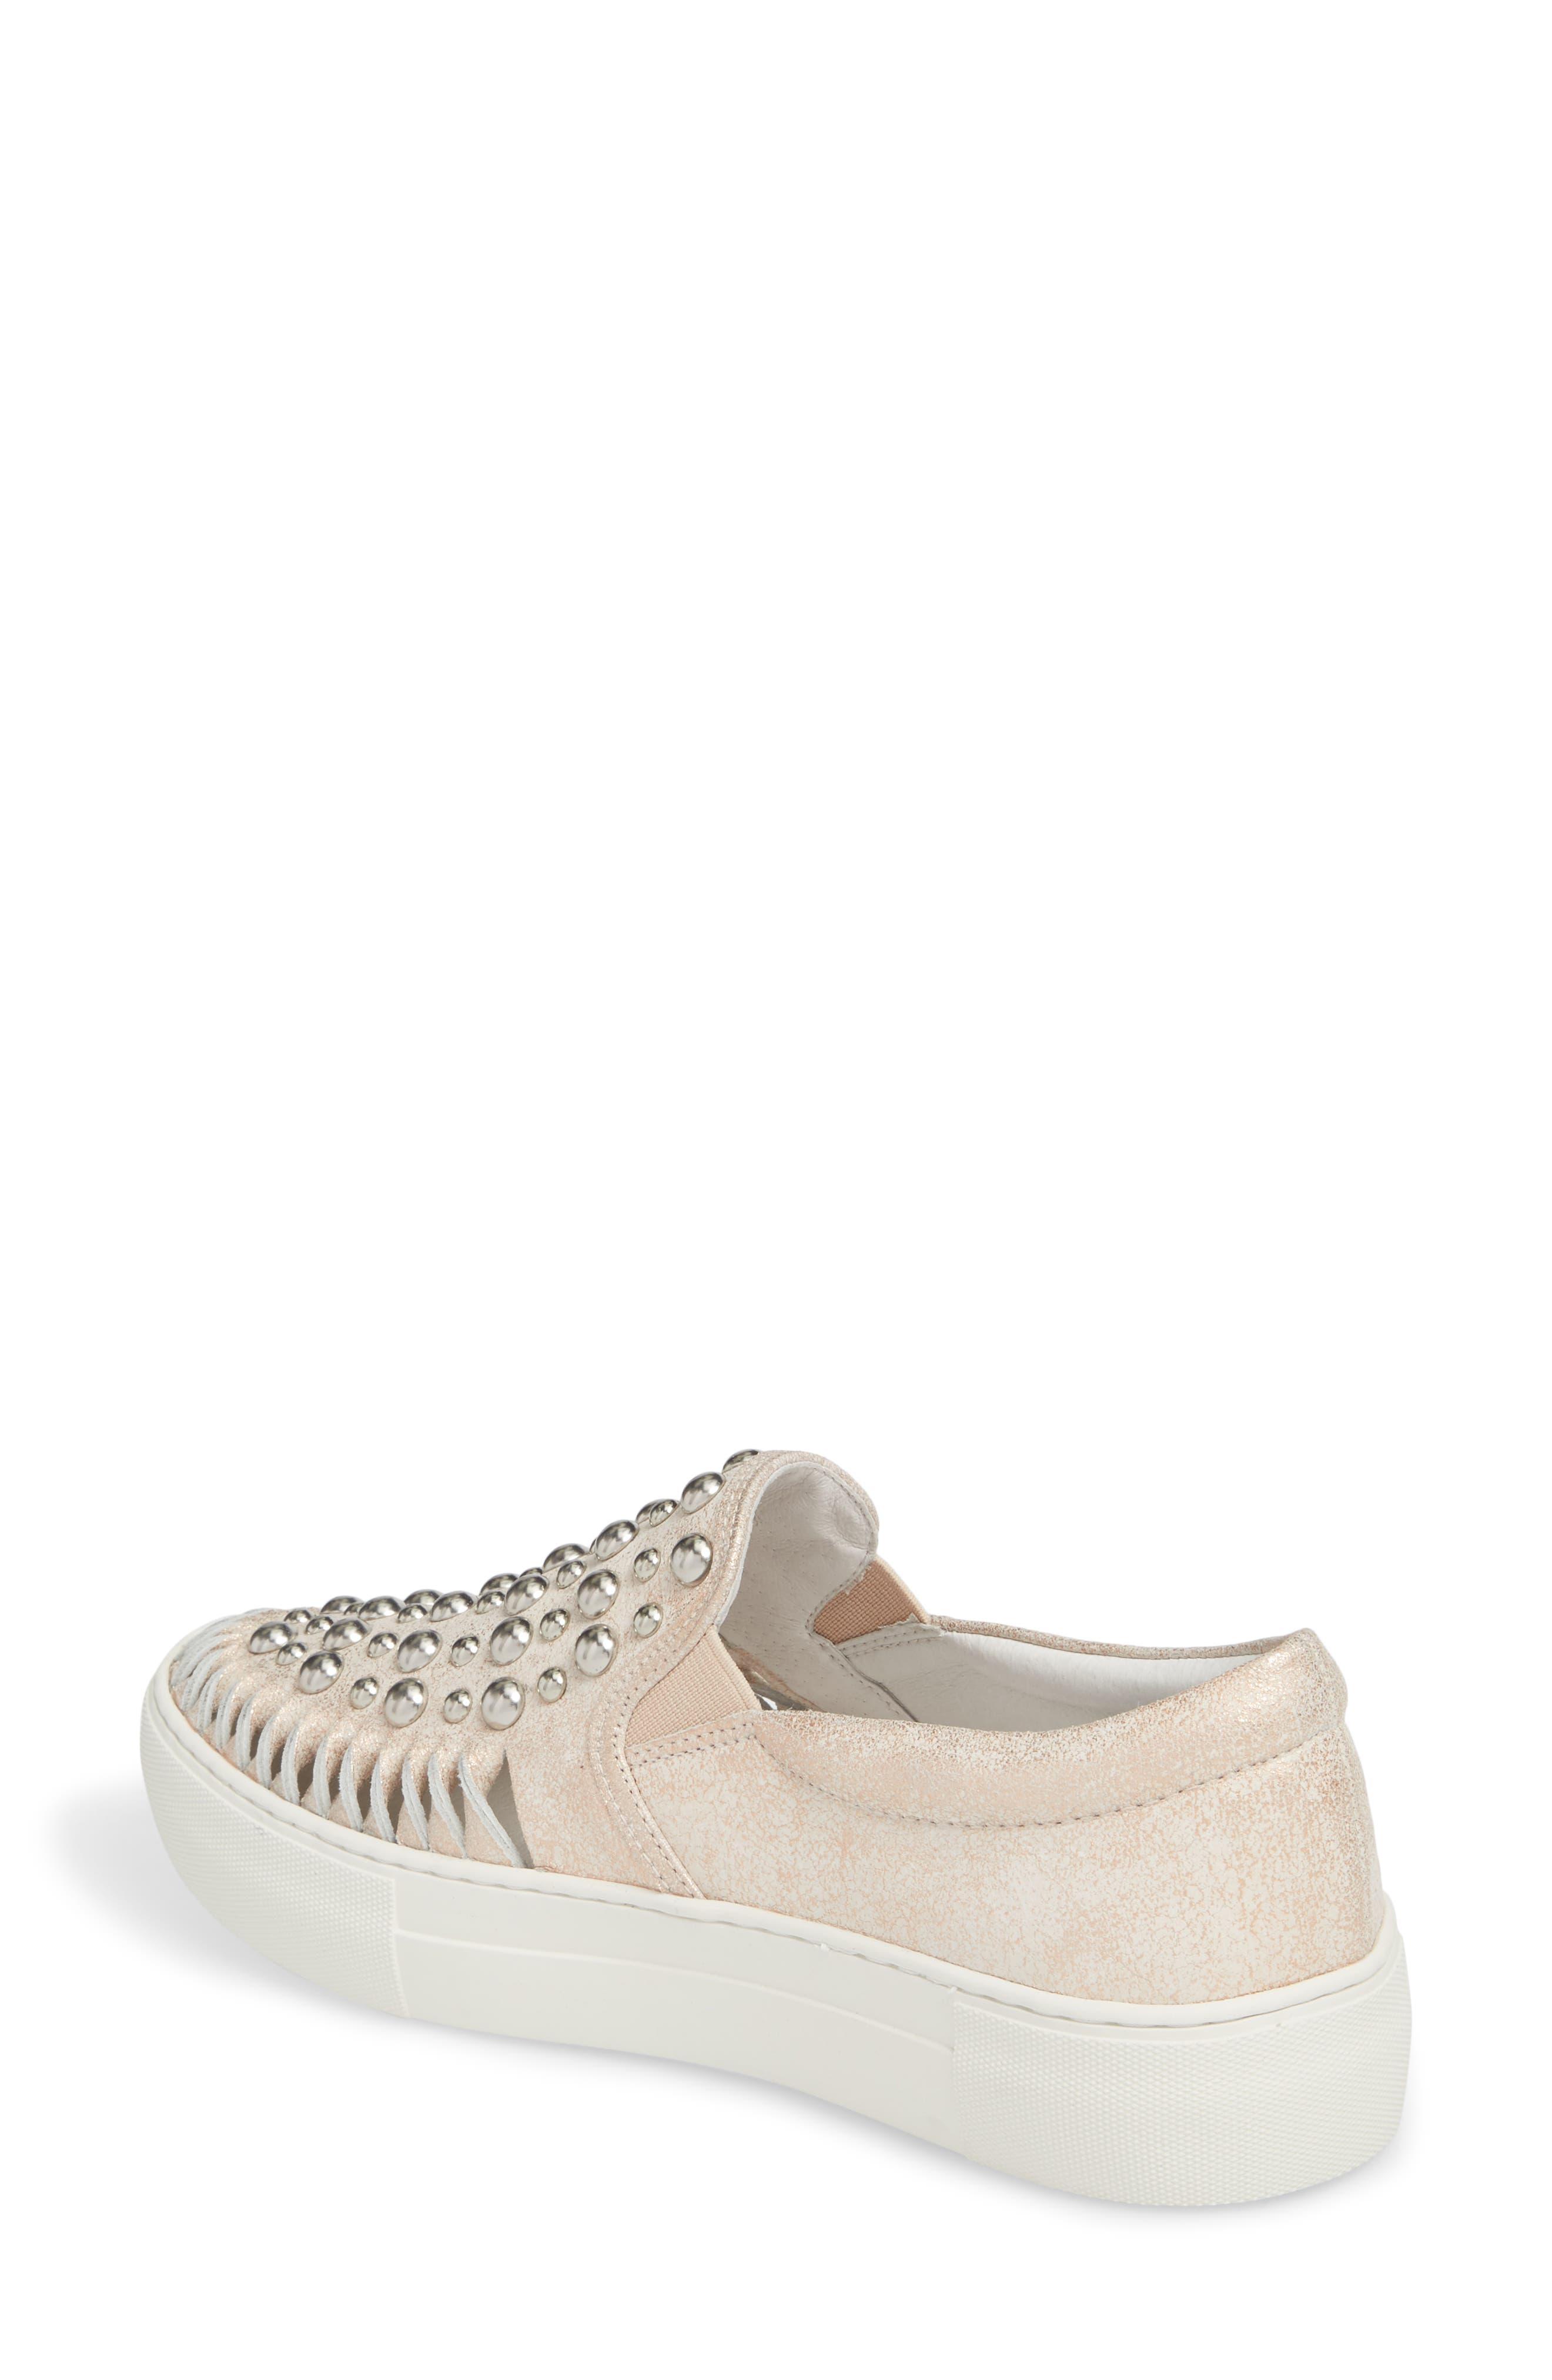 AZT Studded Slip-On Sneaker,                             Alternate thumbnail 2, color,                             Soft Pink Metallic Leather